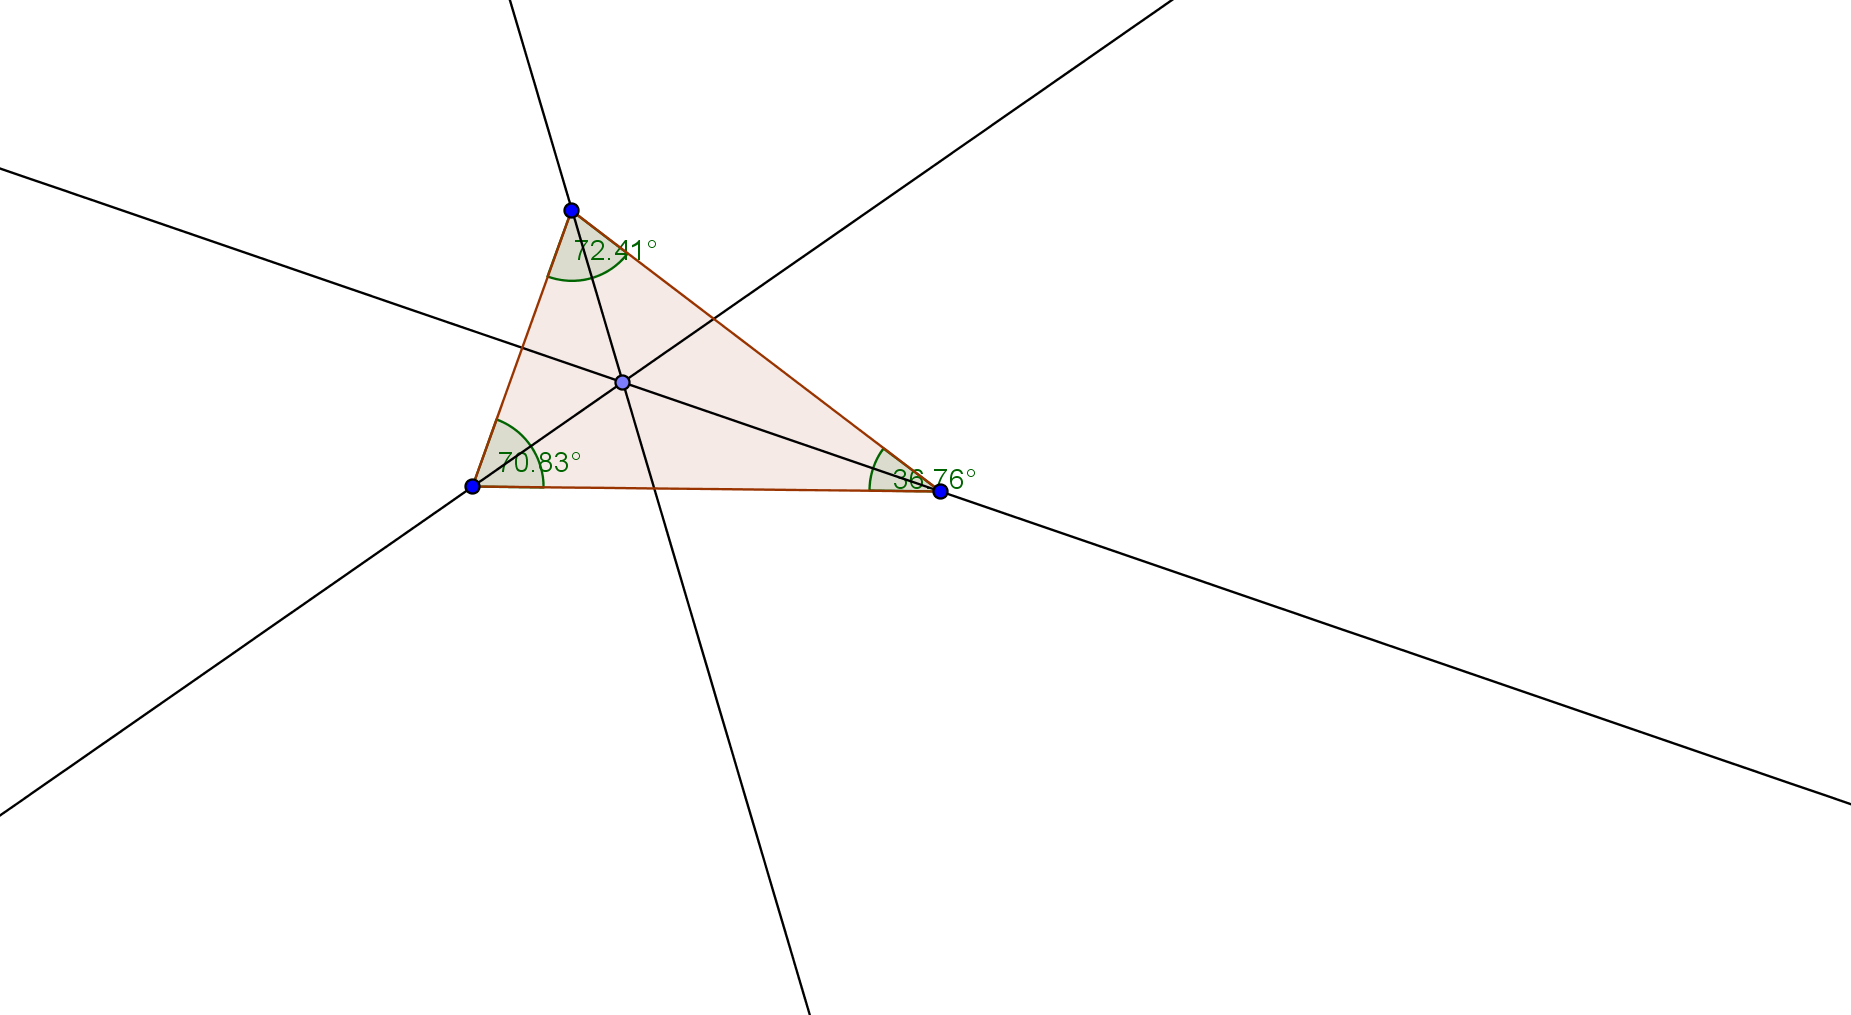 equiangular scalene triangle - photo #22